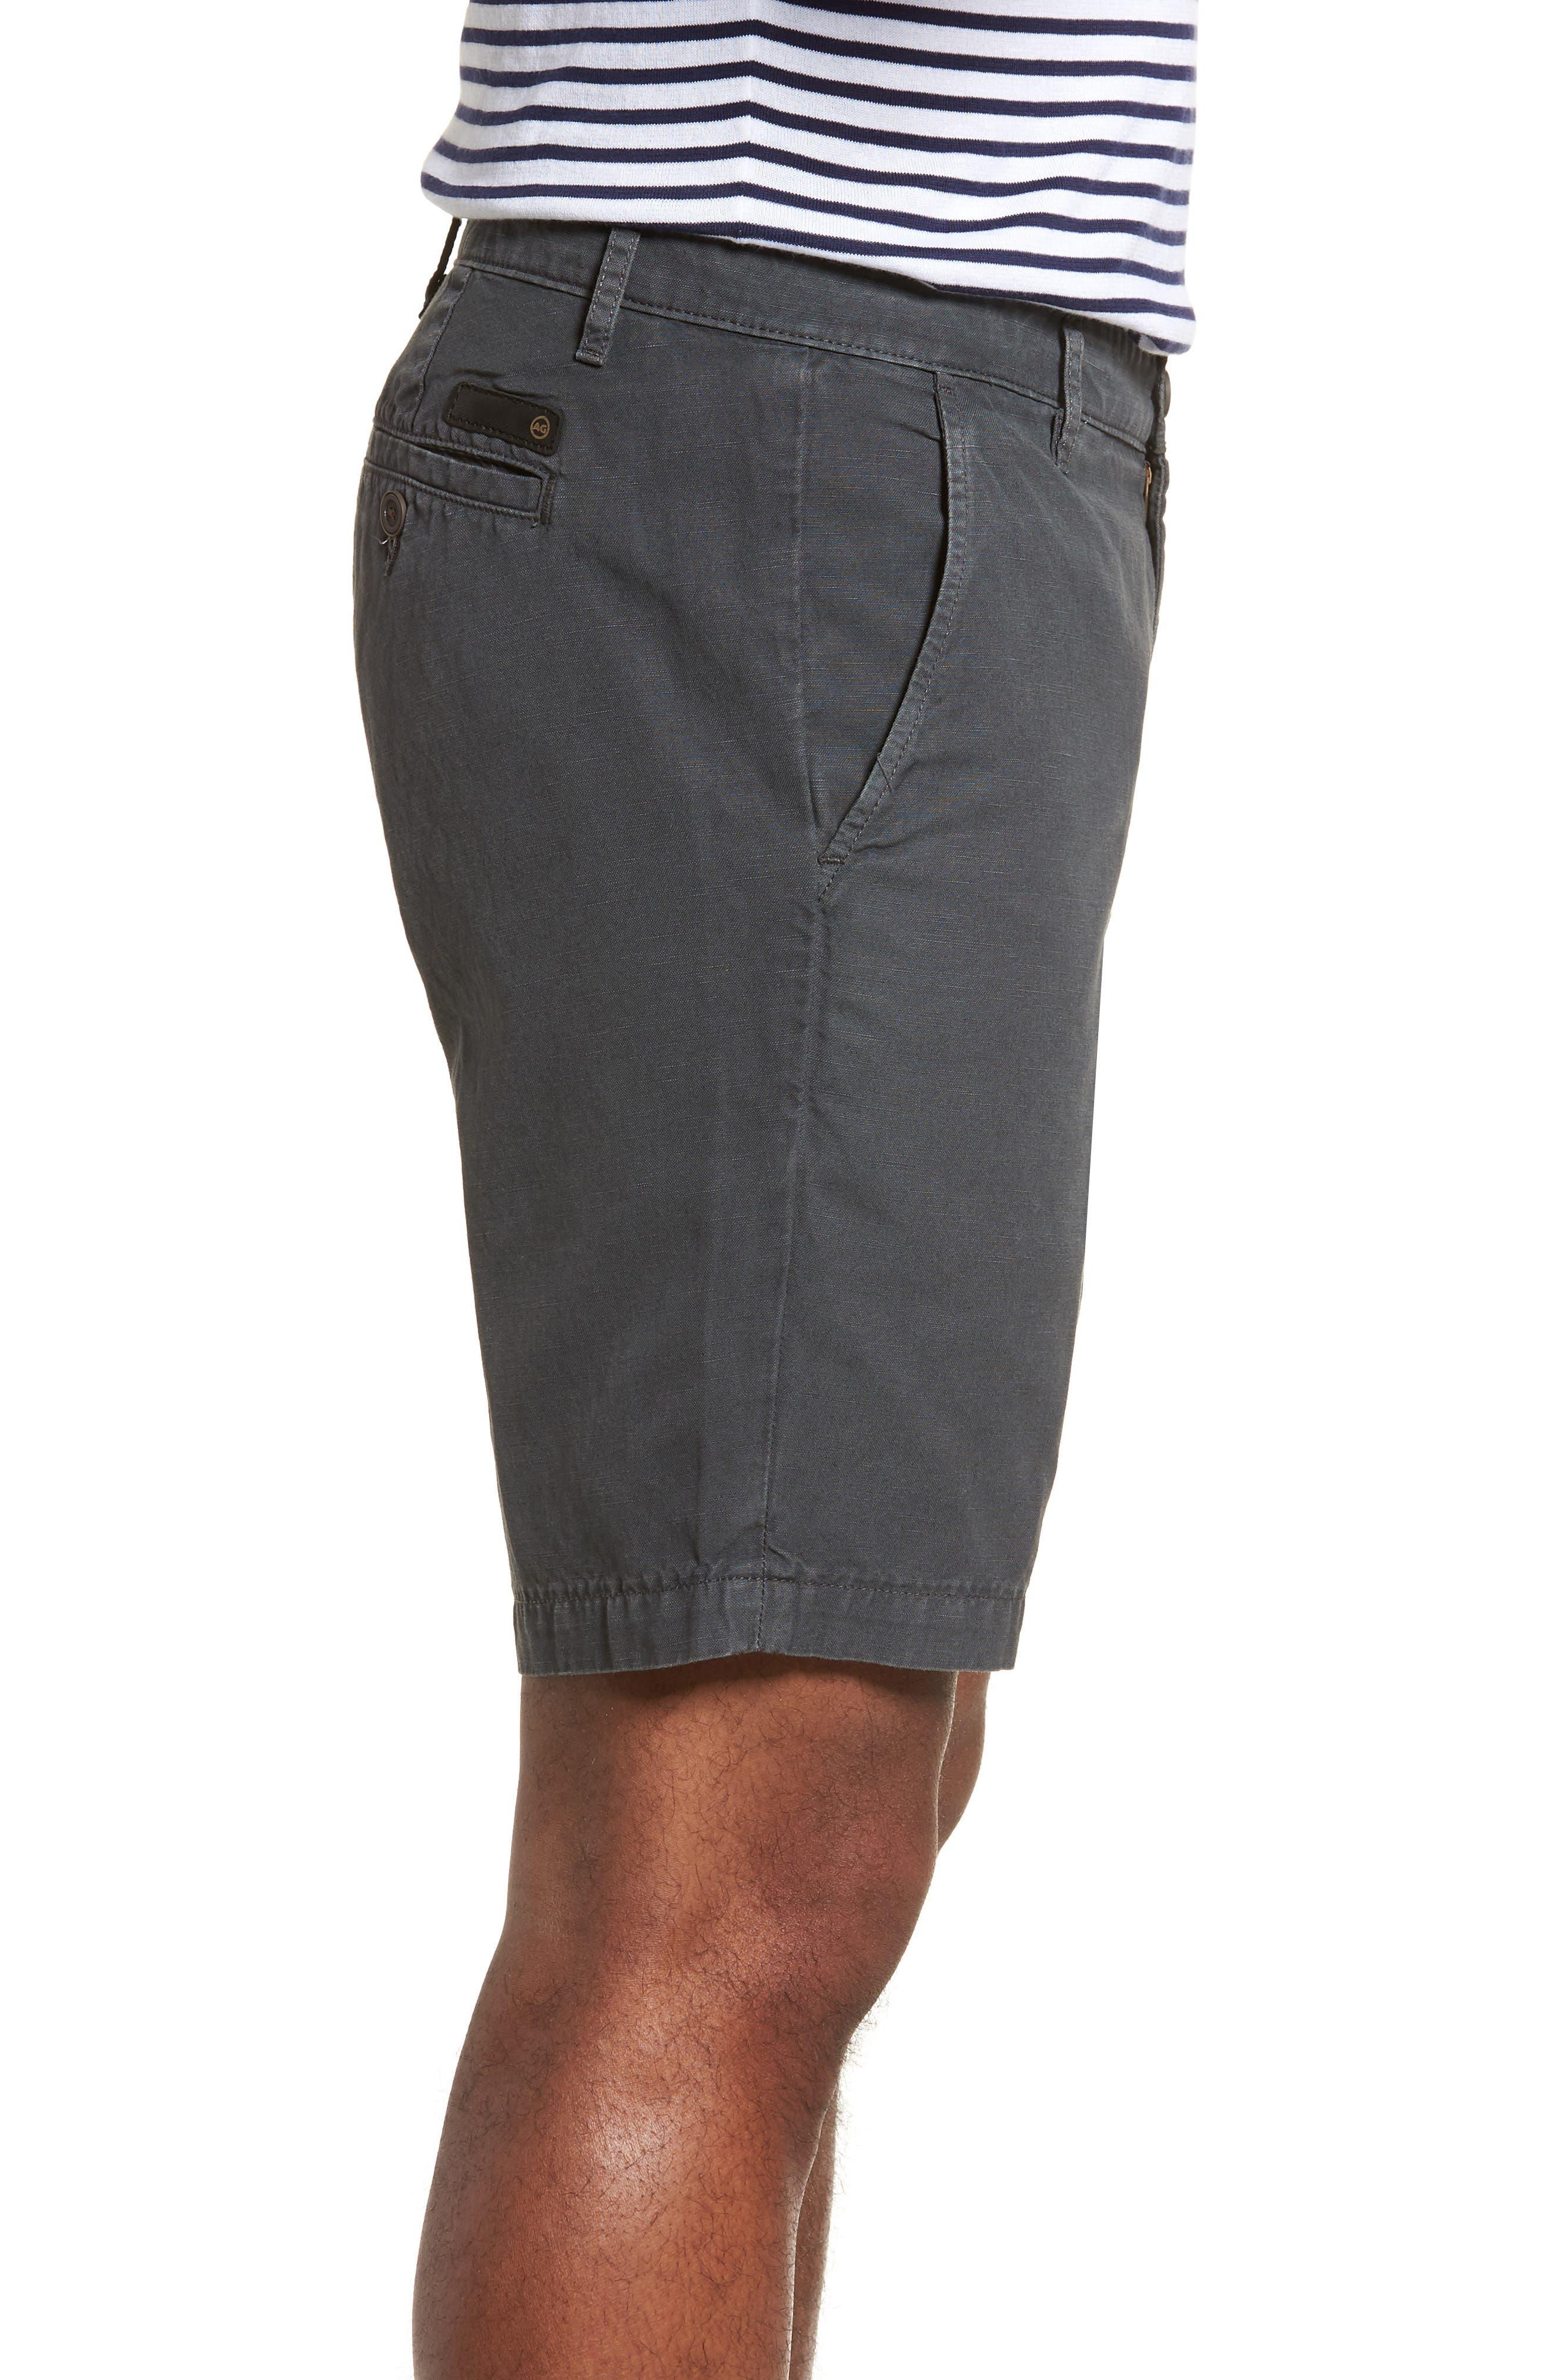 Wanderer Slim Fit Cotton & Linen Shorts,                             Alternate thumbnail 3, color,                             SULFUR SMOKE GREY